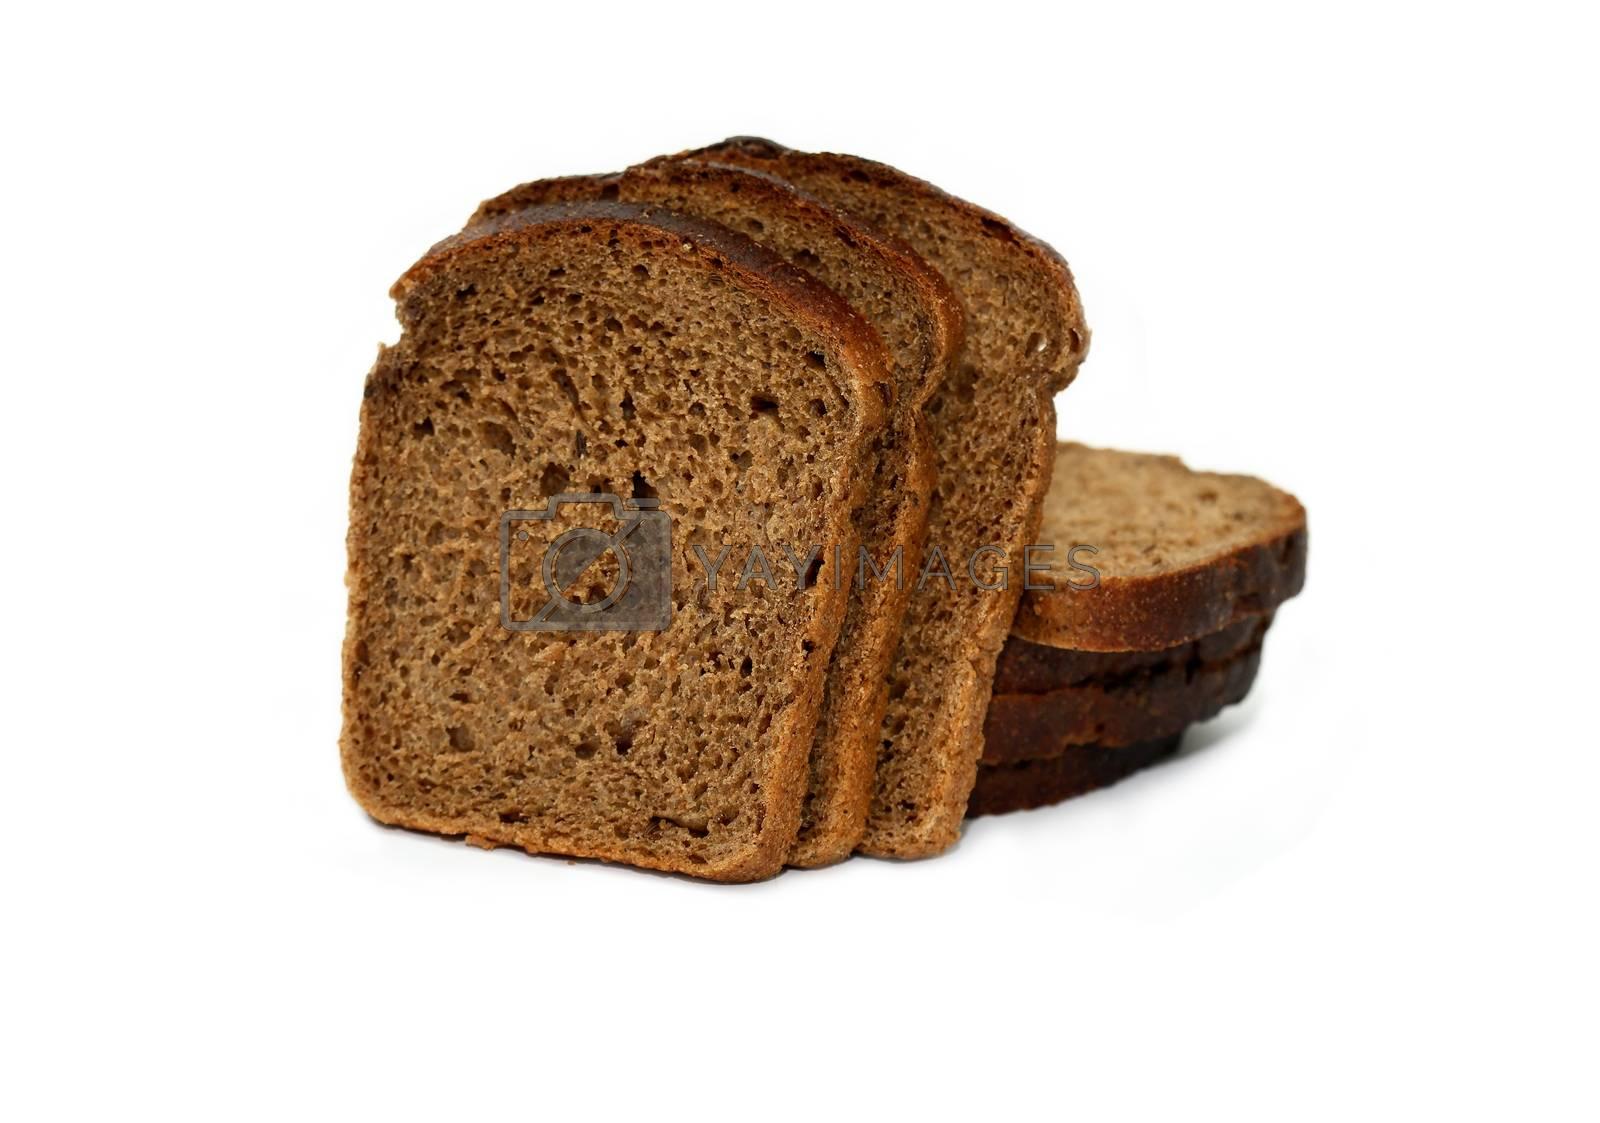 Royalty free image of Sliced Rye Bread by kvkirillov